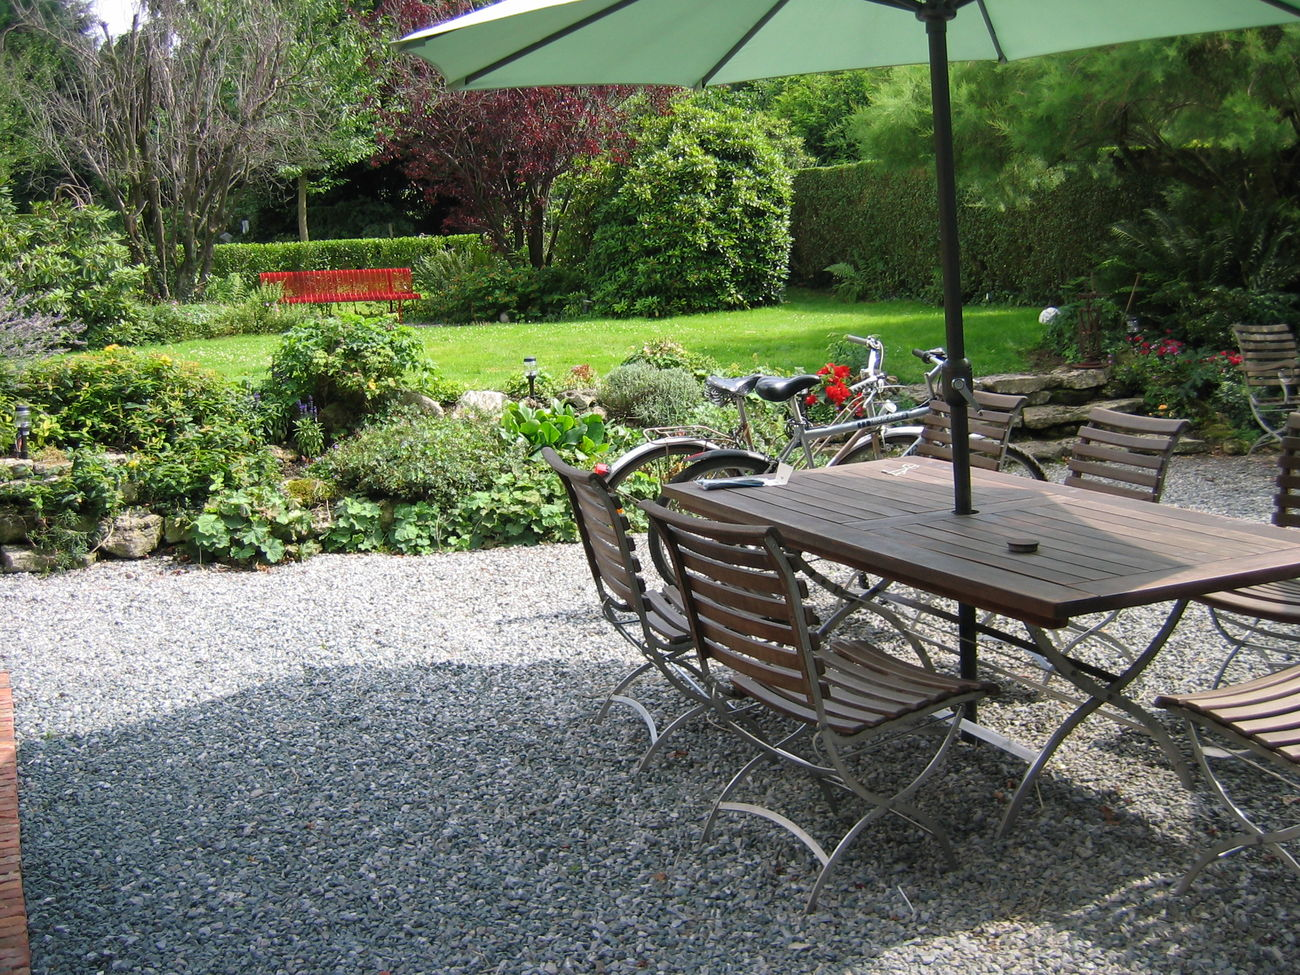 Alg tuinwerken frank willeghems wezembeek oppem t l for Entretien jardin 35